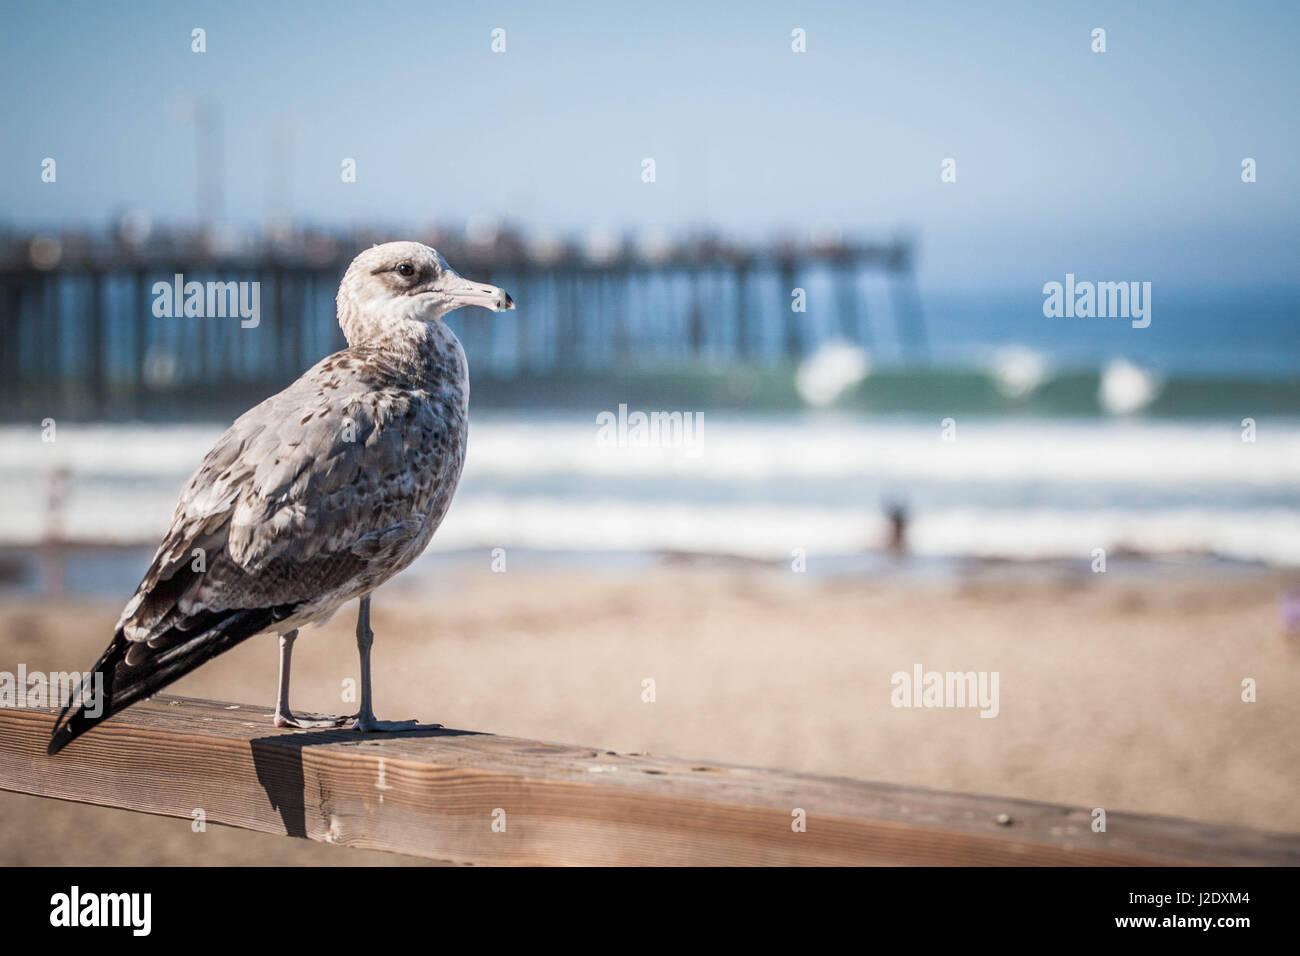 Seagull_0366   - Stock Image